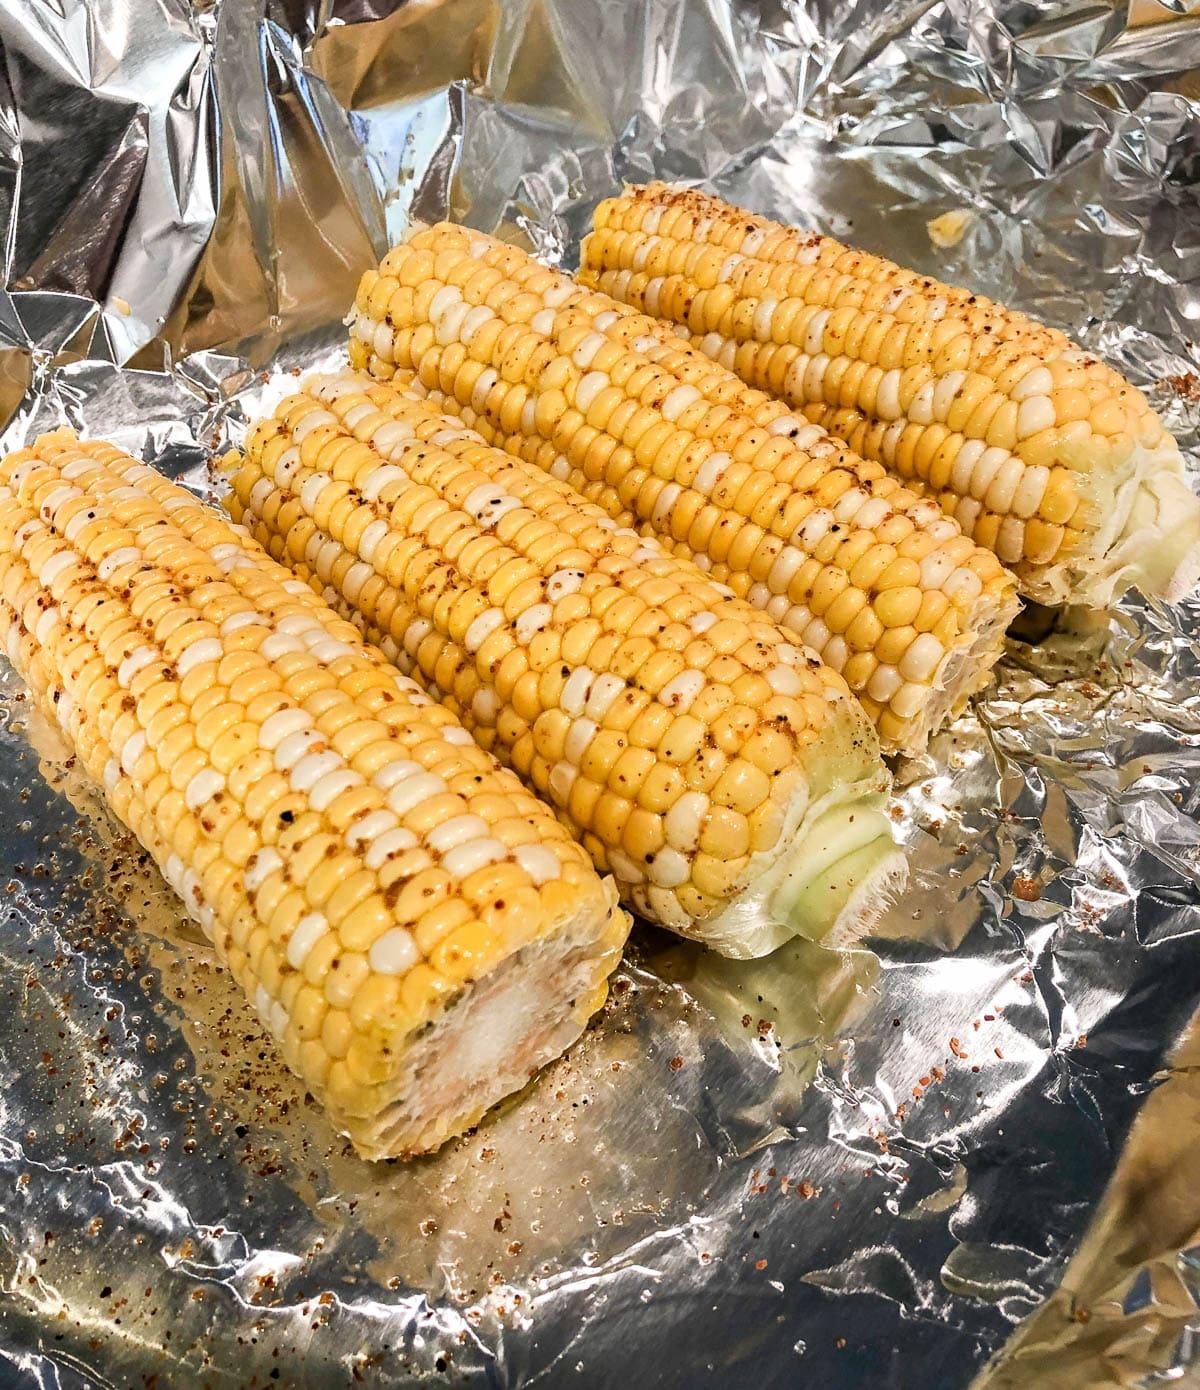 corn on the cob in foil